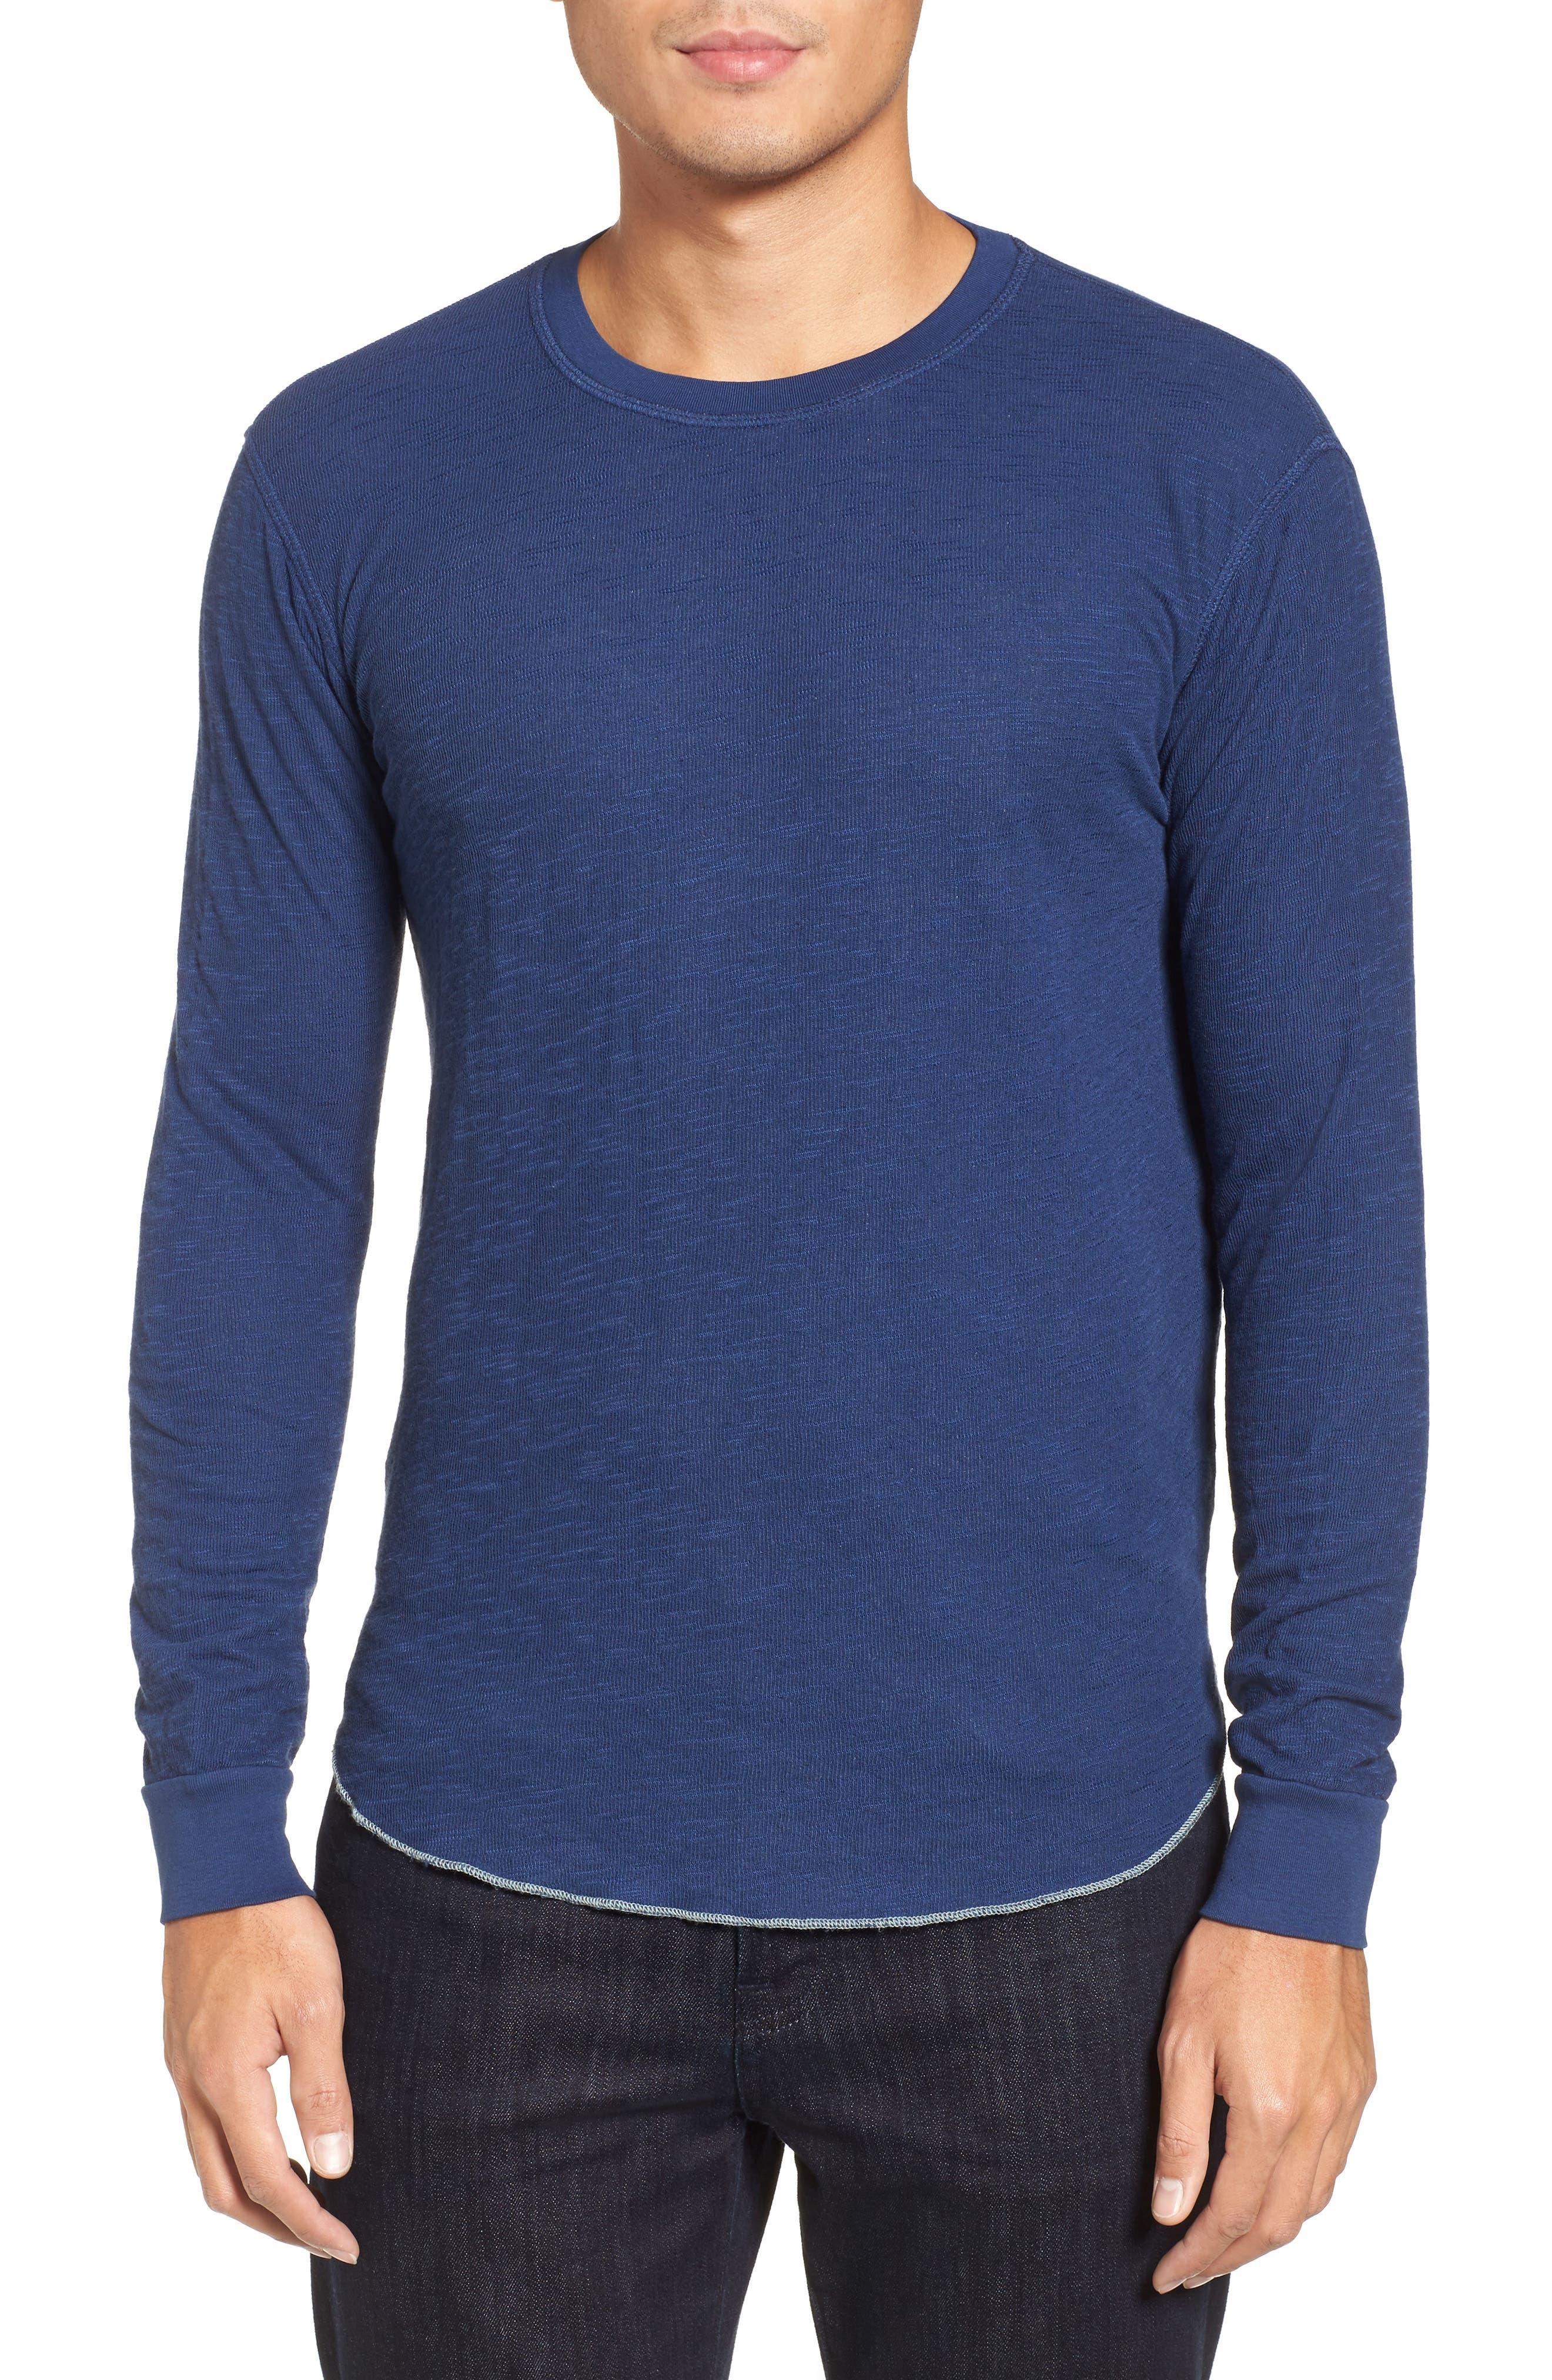 Main Image - Goodlife Double Layer Slim Crewneck T-Shirt